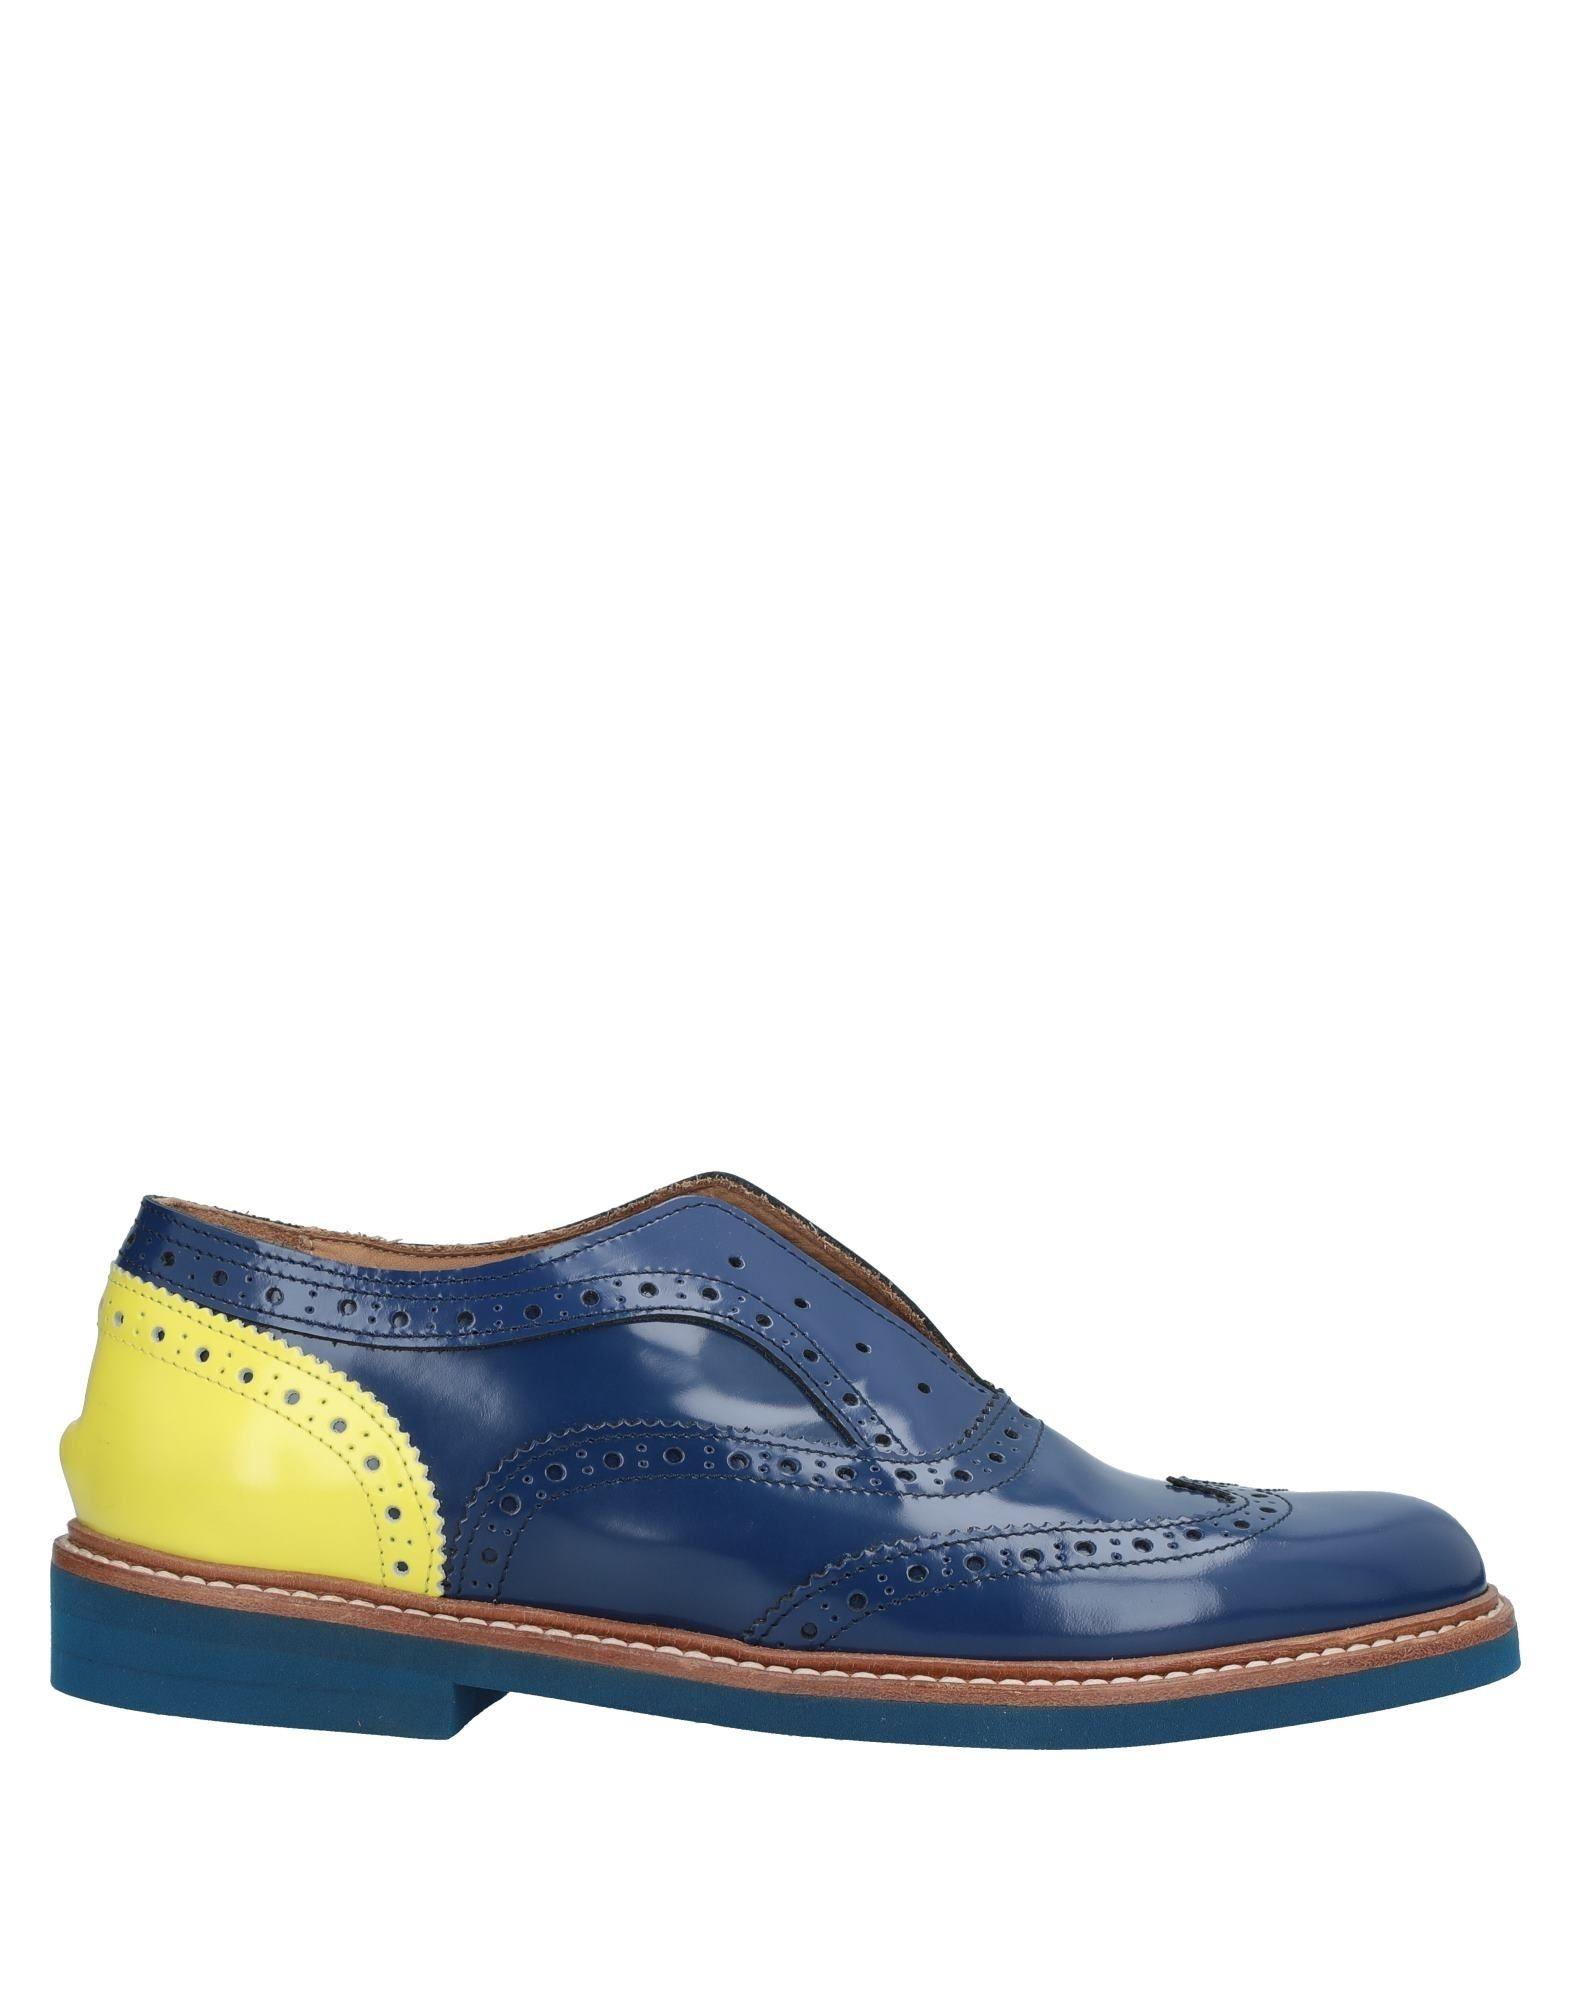 L'f Shoes Mokassins Herren  11537156TM Gute Qualität beliebte Schuhe